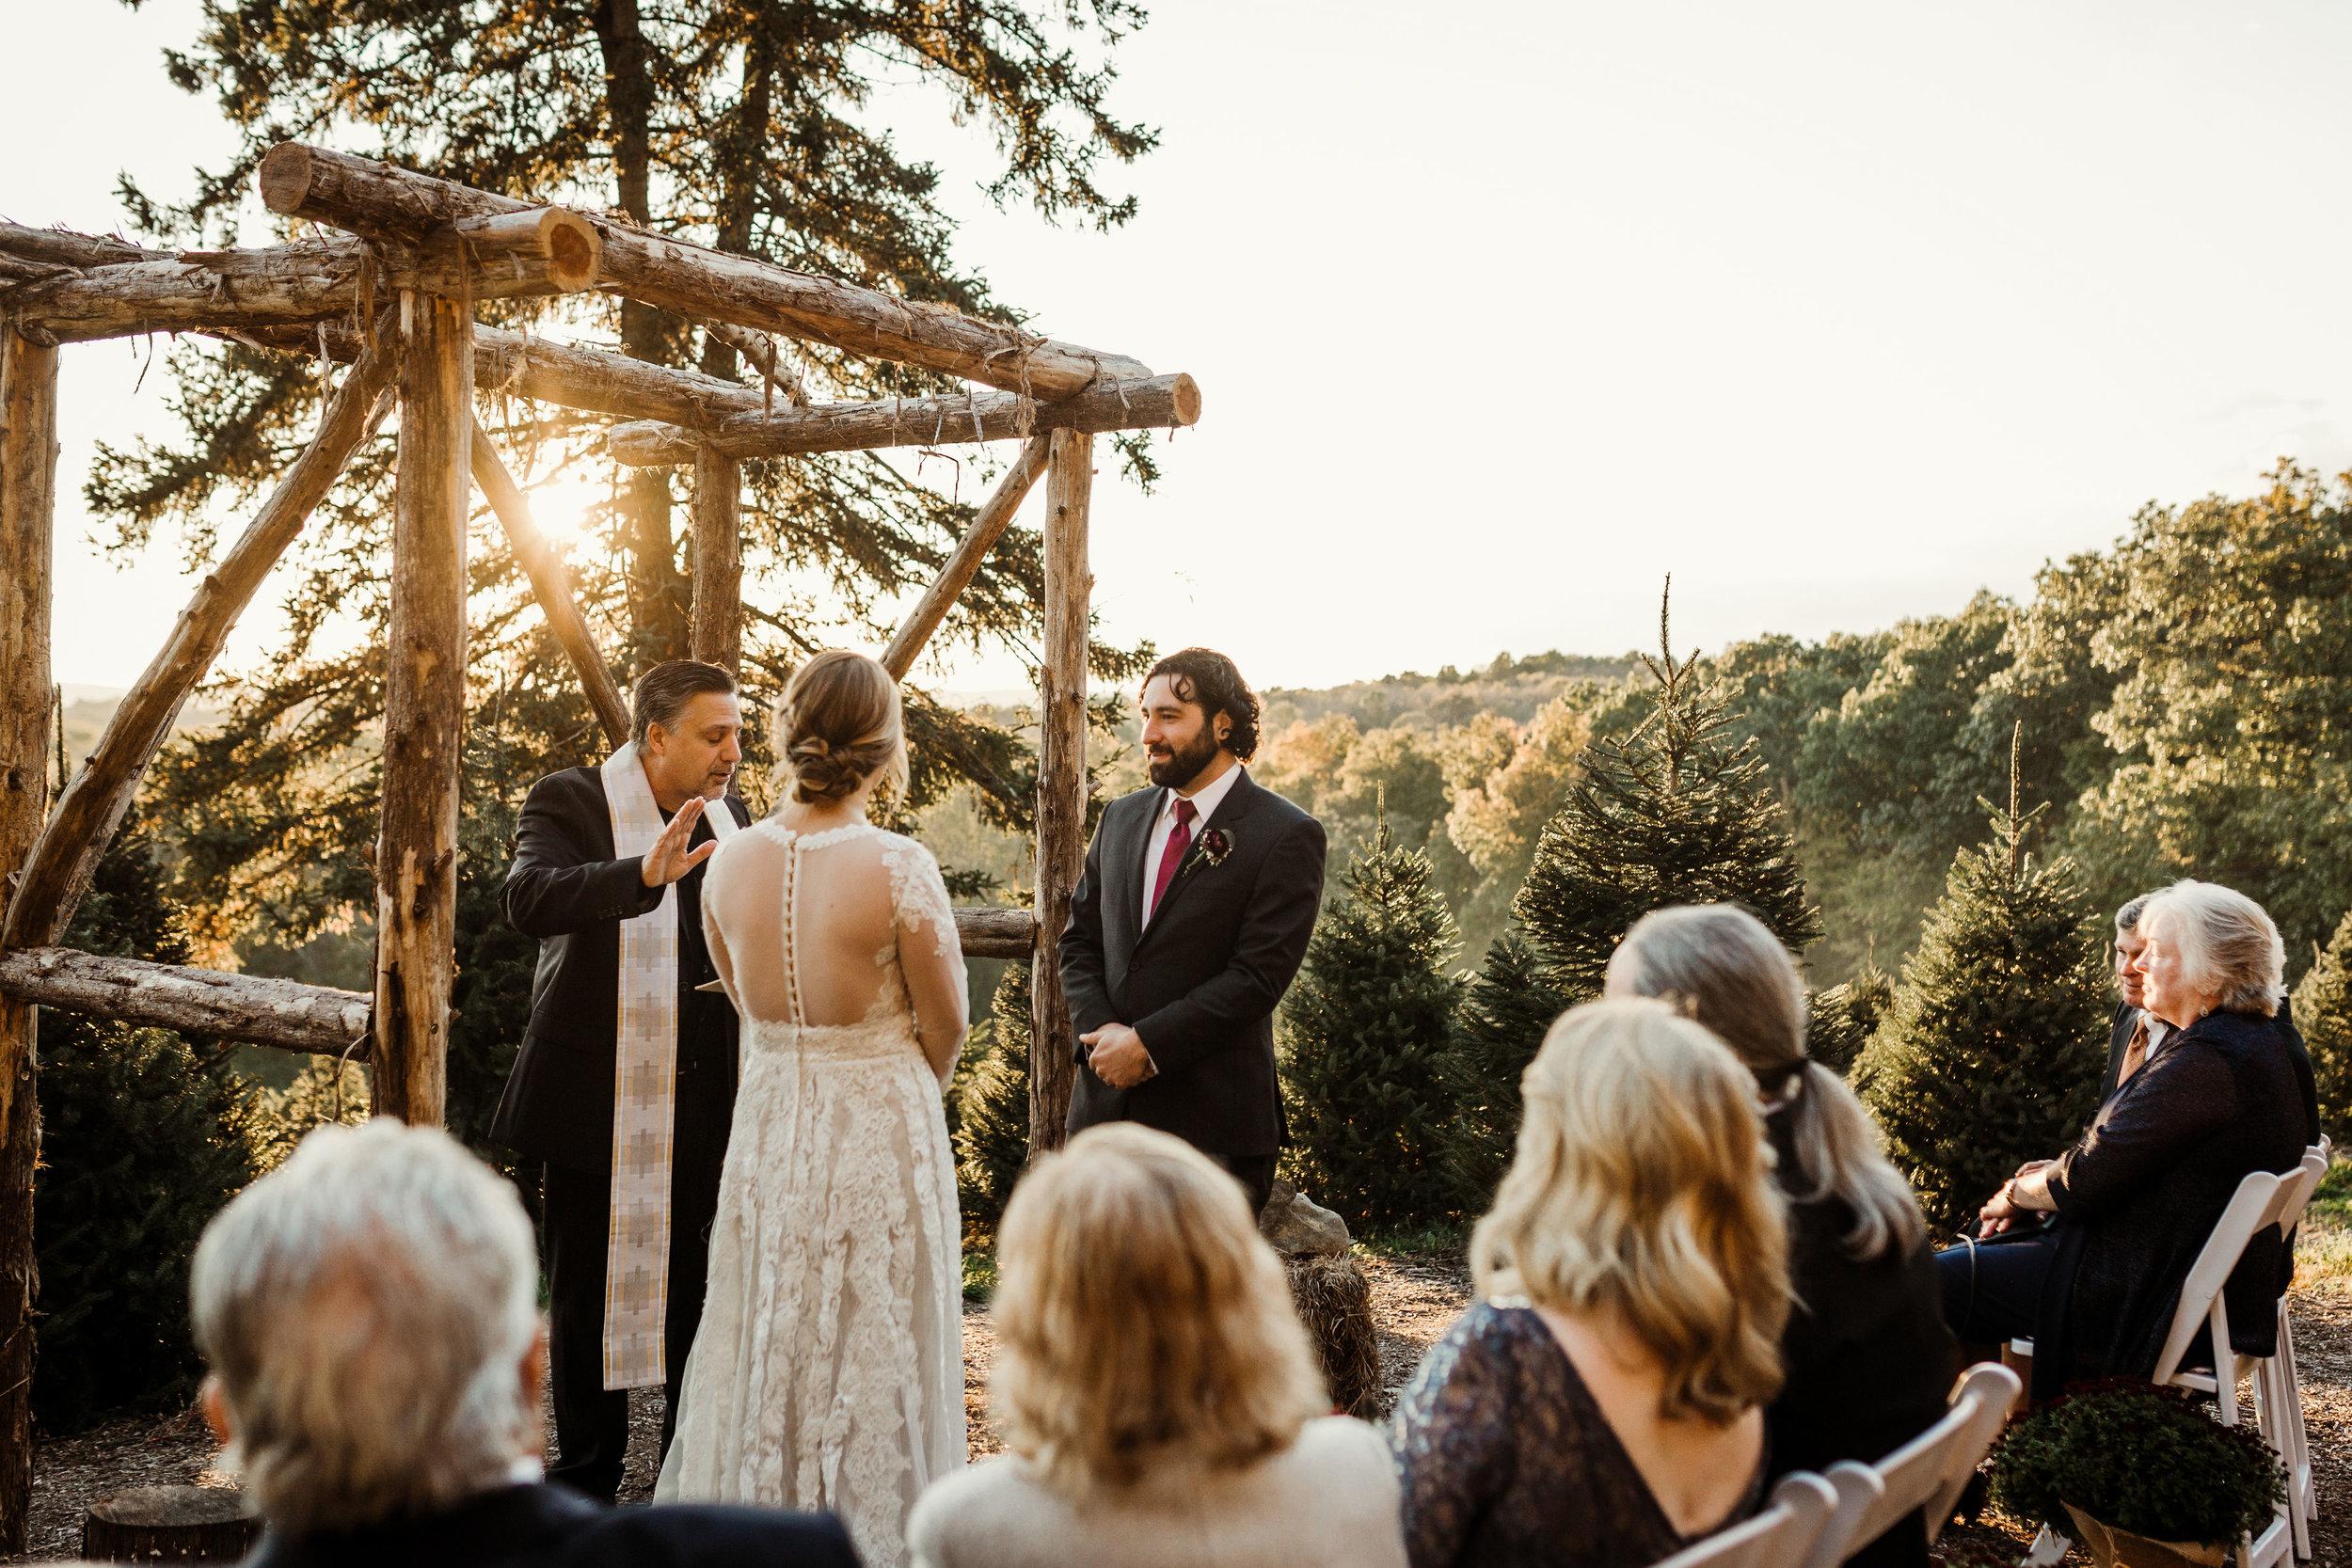 young-love-media-rustic-fall-autumn-wedding-emmerich-tree-farm-hudson-valley-warwick-new-york-ceremony-273.jpg